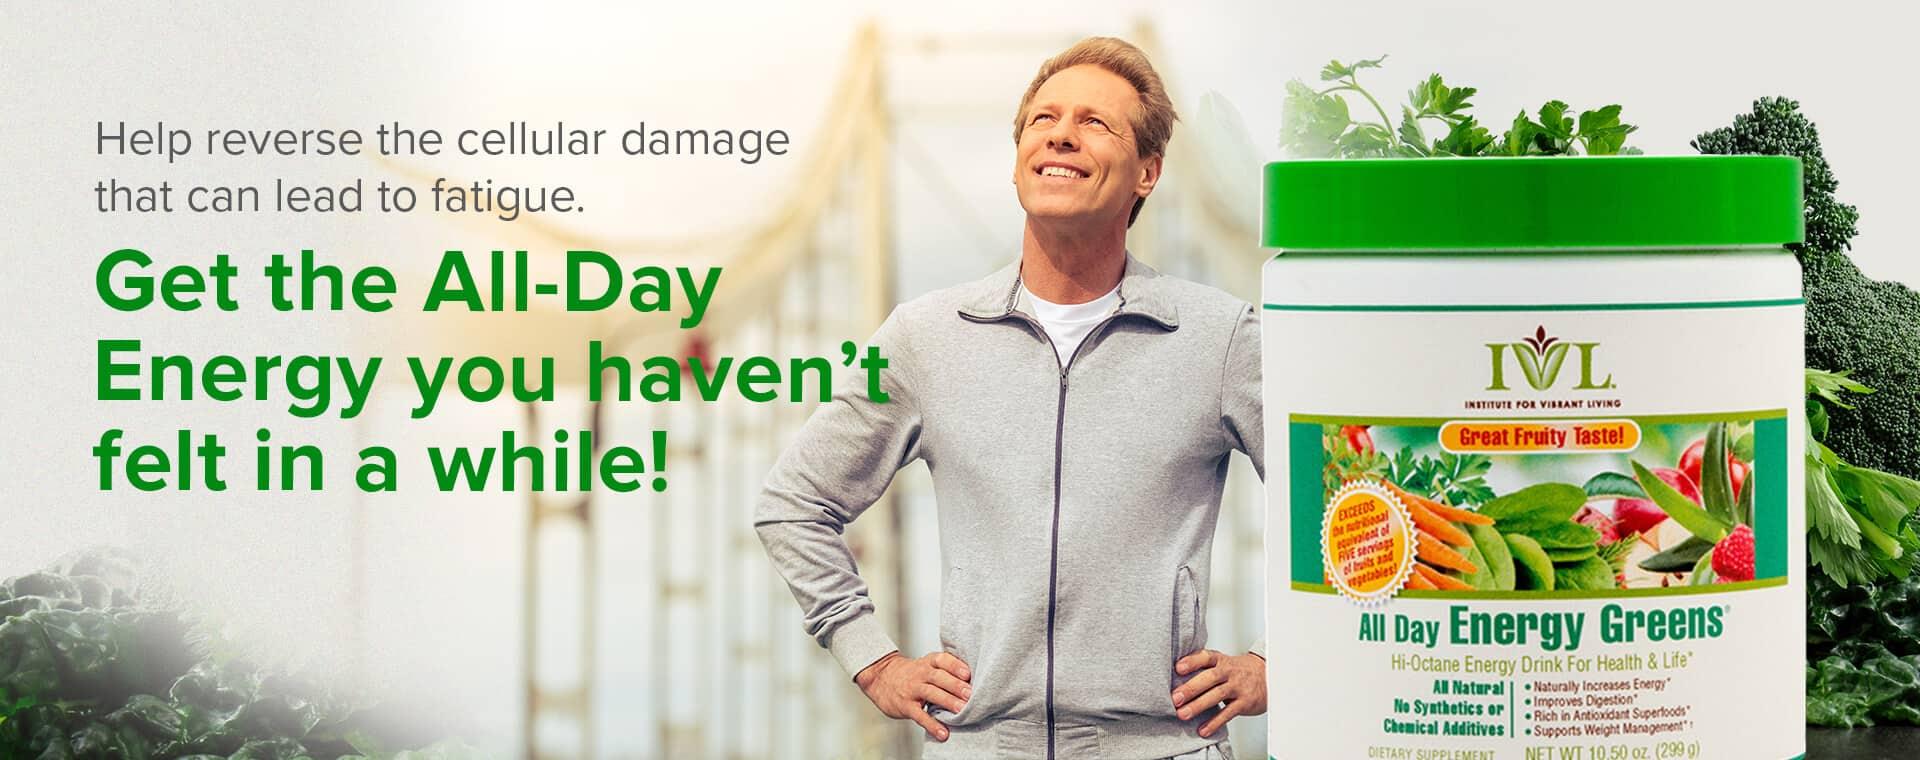 All Day Energy Greens Customer Testimonials